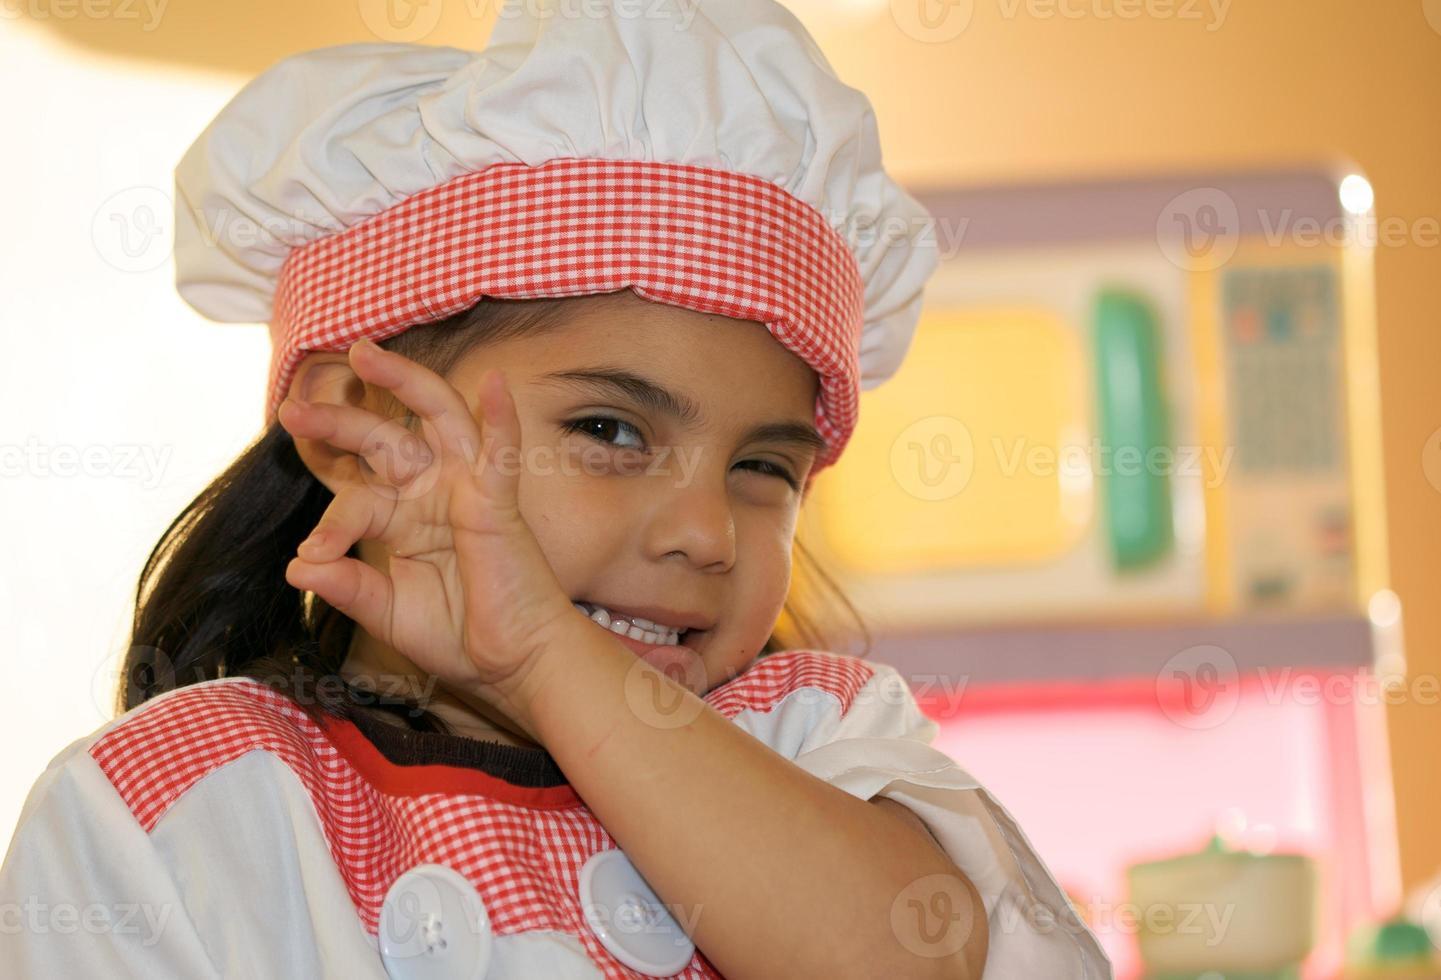 Little Chef photo